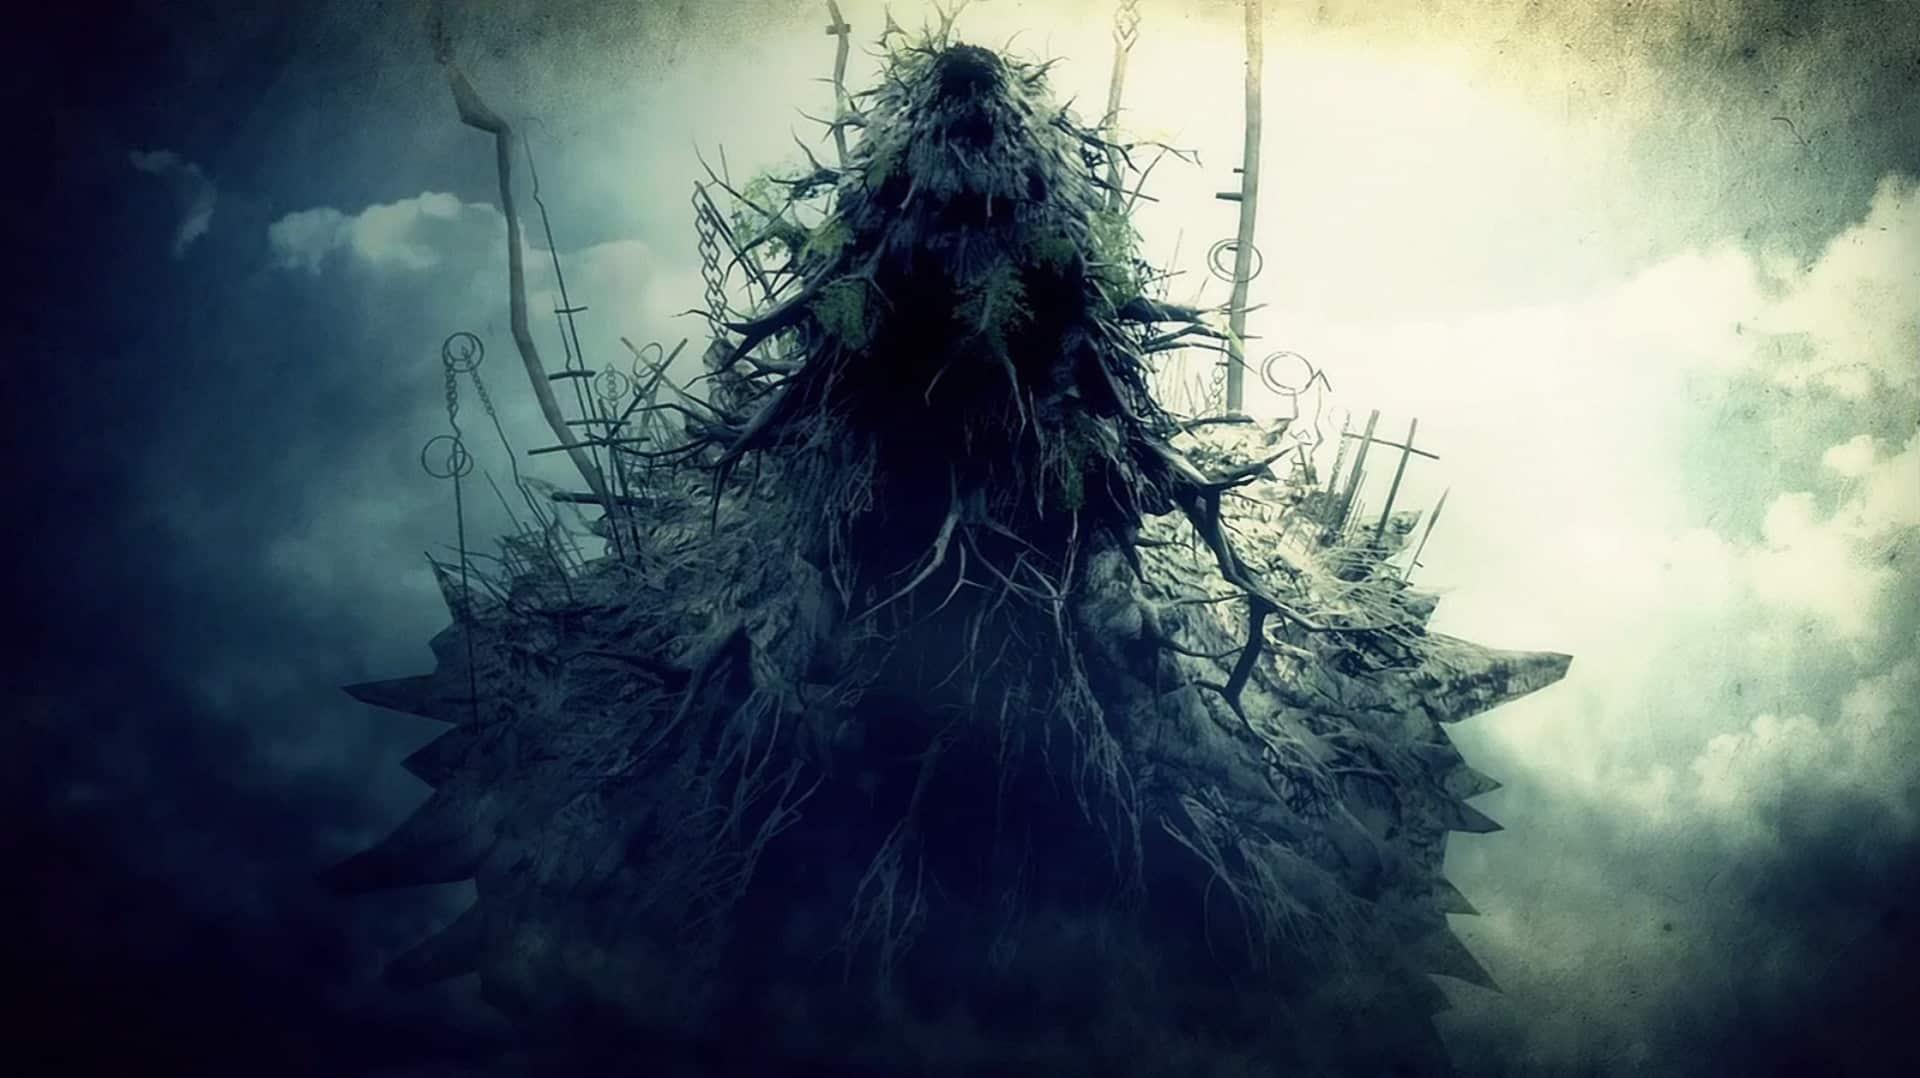 slow apocalypse of corrupting evil fog in PlayStation 3 PS3 FromSoftware Demon's Souls